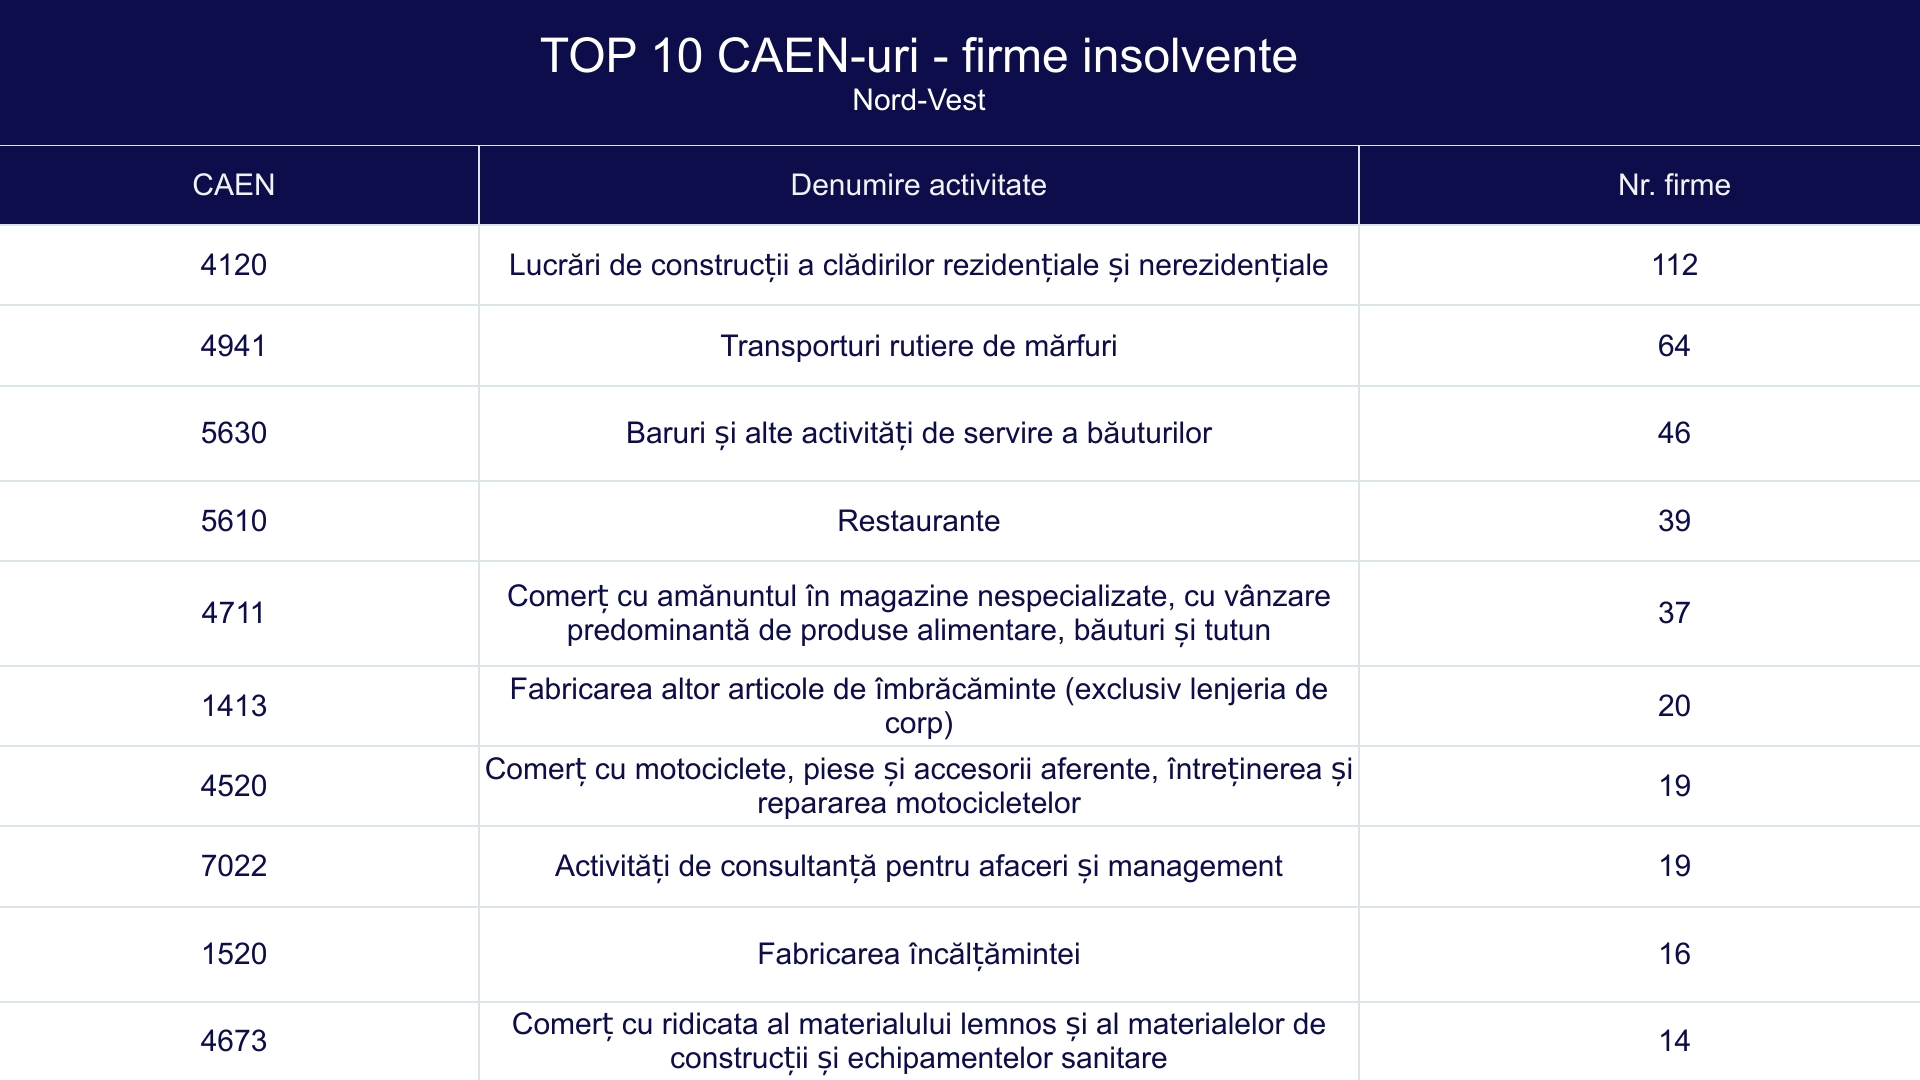 TOP 10 CAEN-uri - firme insolvente - Nord-Vest